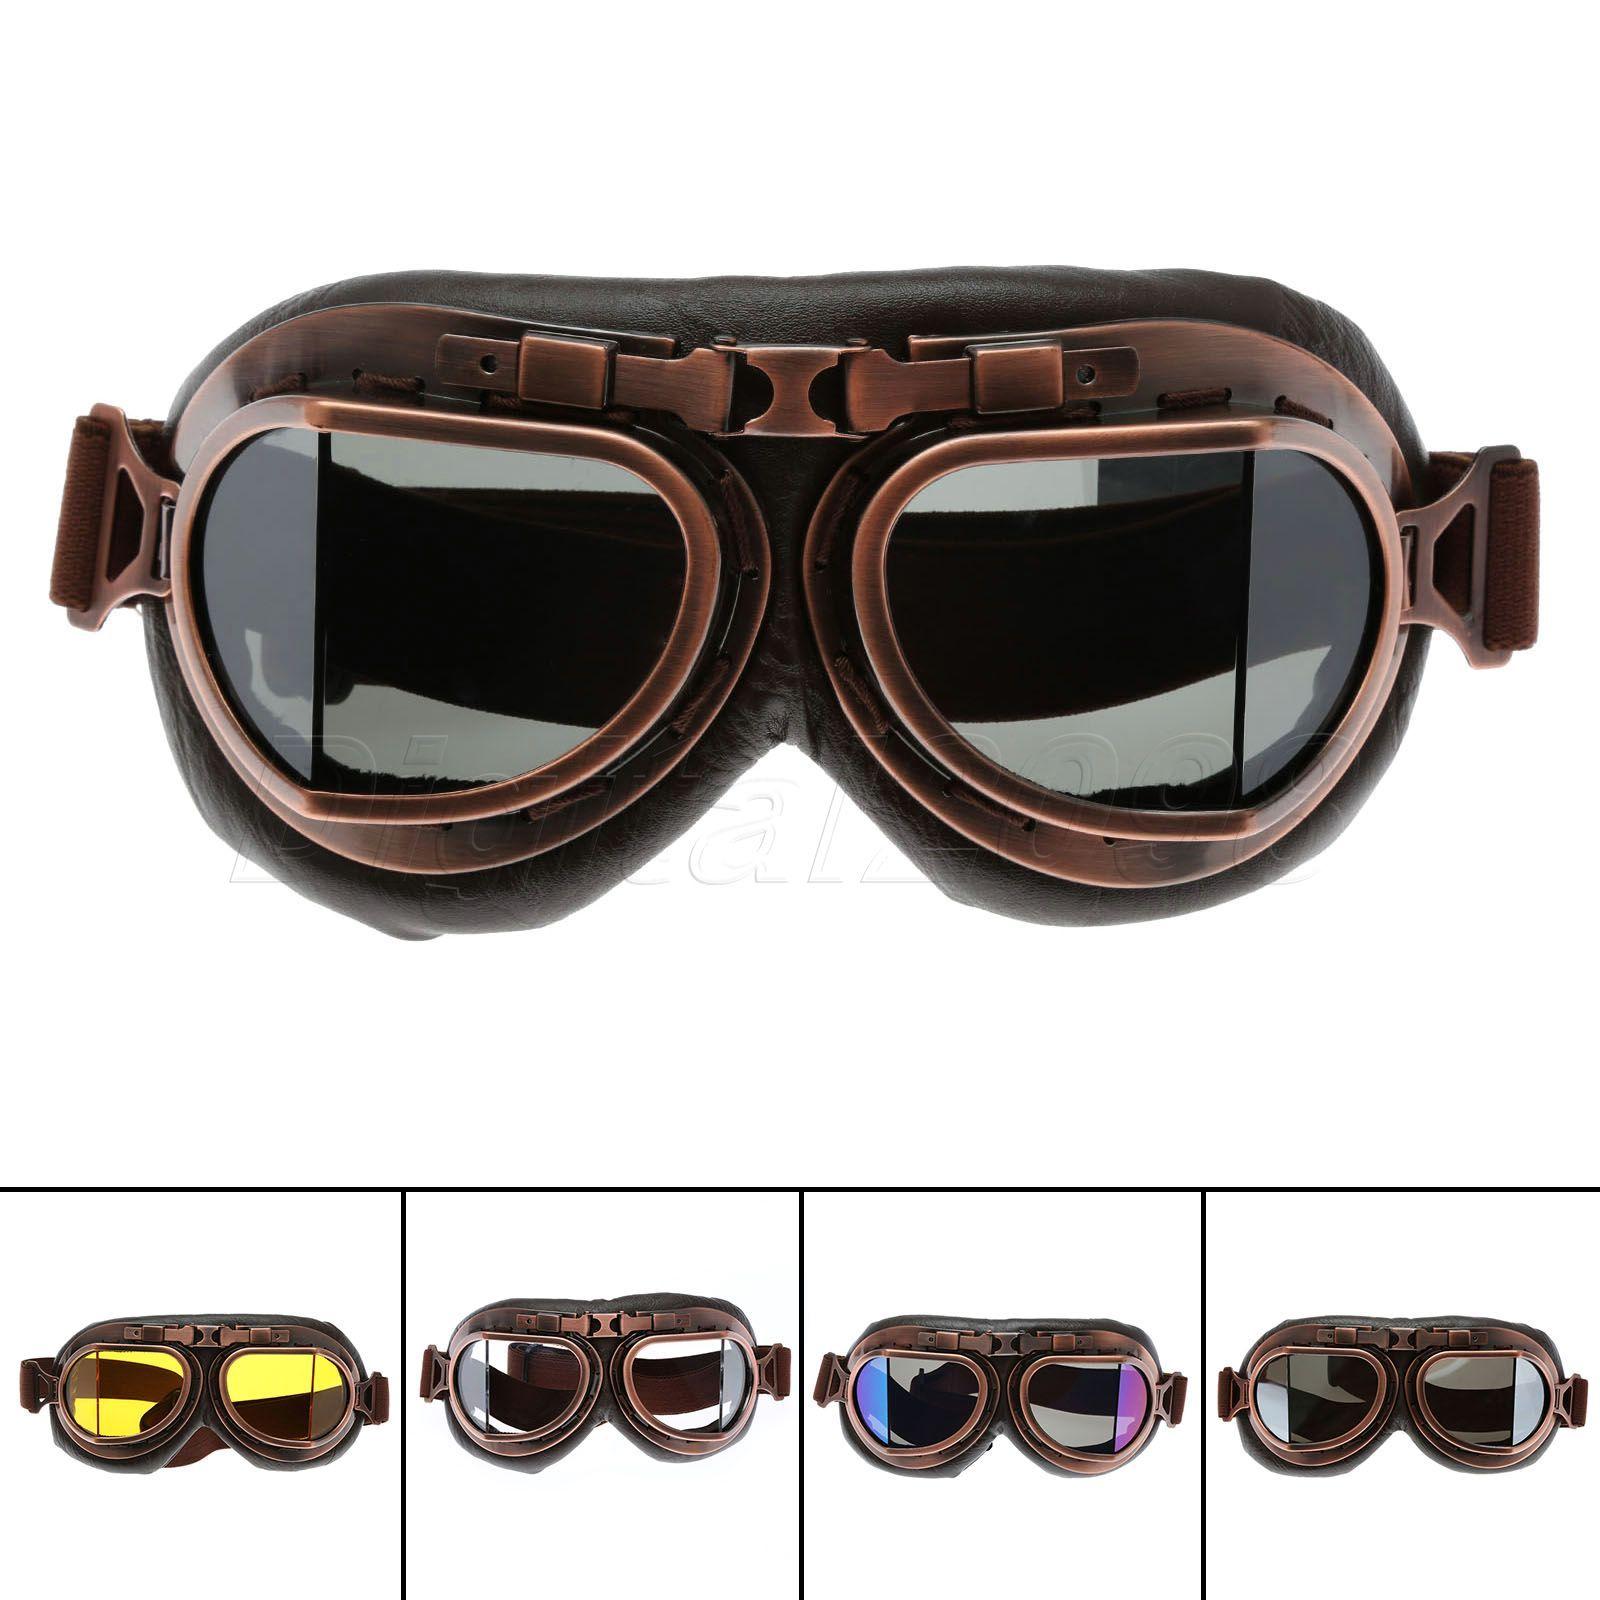 Yetaha WWII RAF Vintage moto lunettes Motocross aviateur pilote Cruiser lunettes ATV Dirt Bike moteur casque 5 couleurs